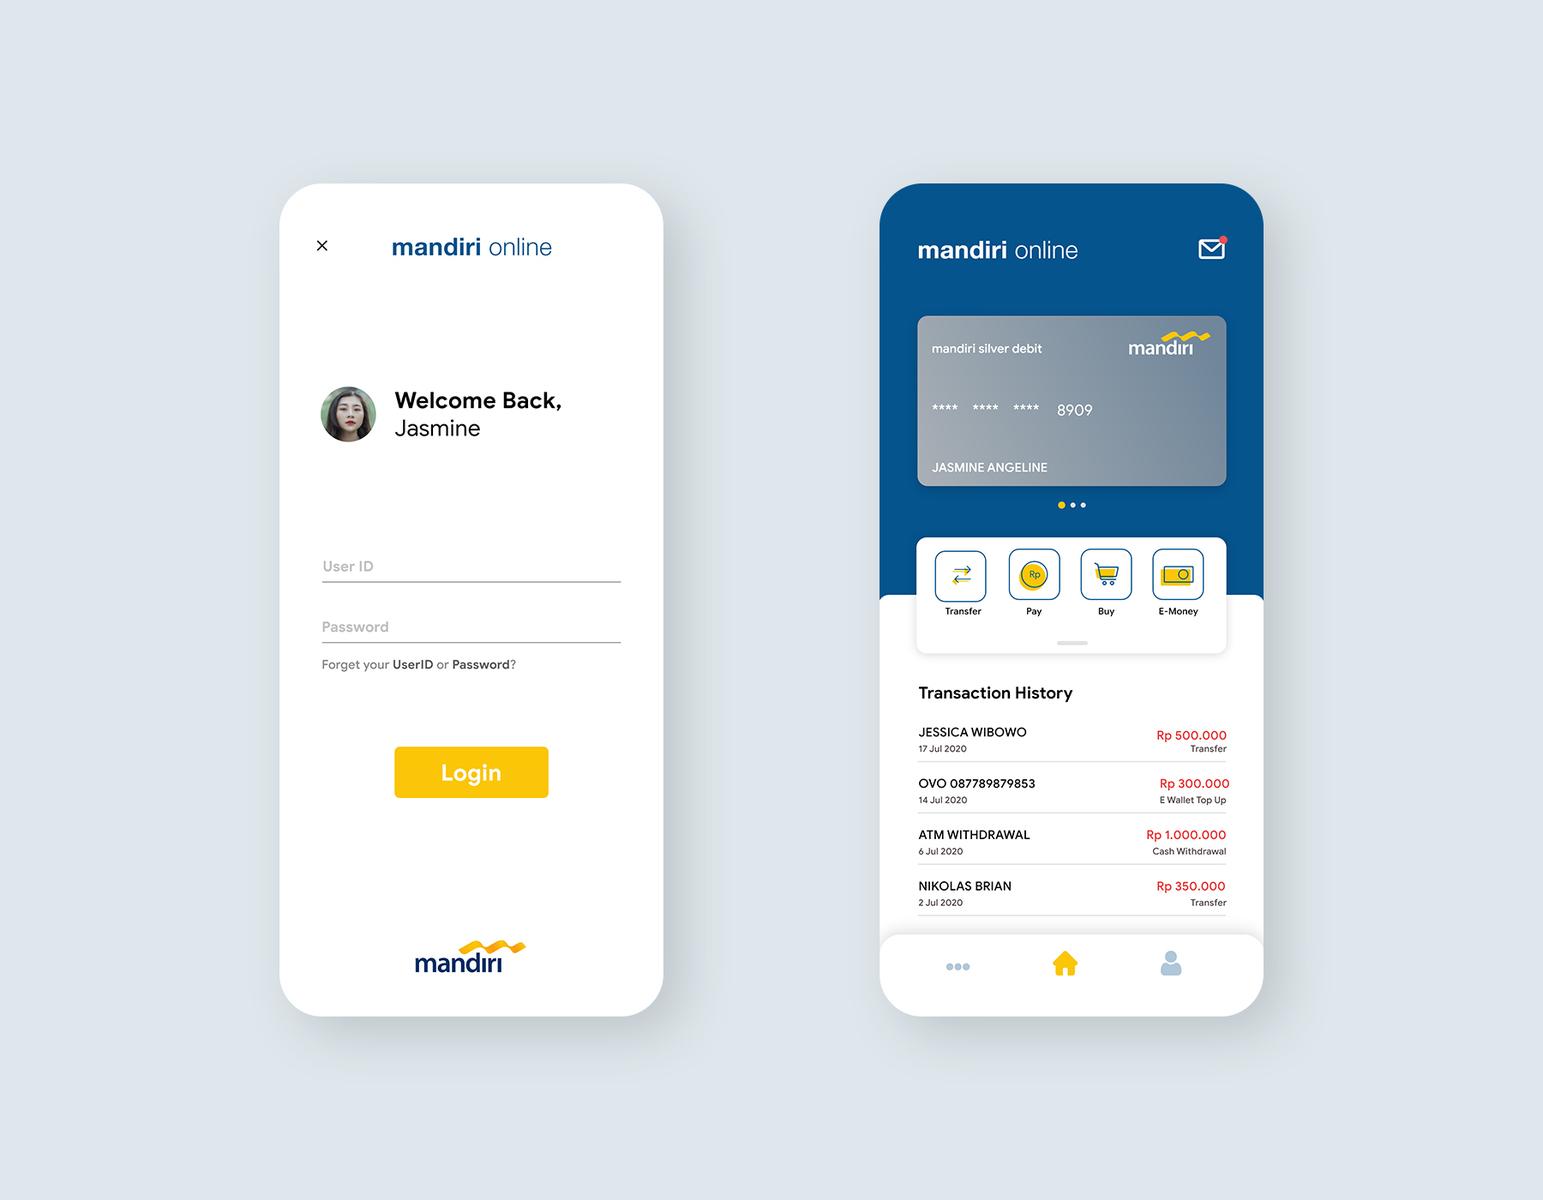 Mandiri Online App Redesign By Fadhil Ezar Rahman On Dribbble